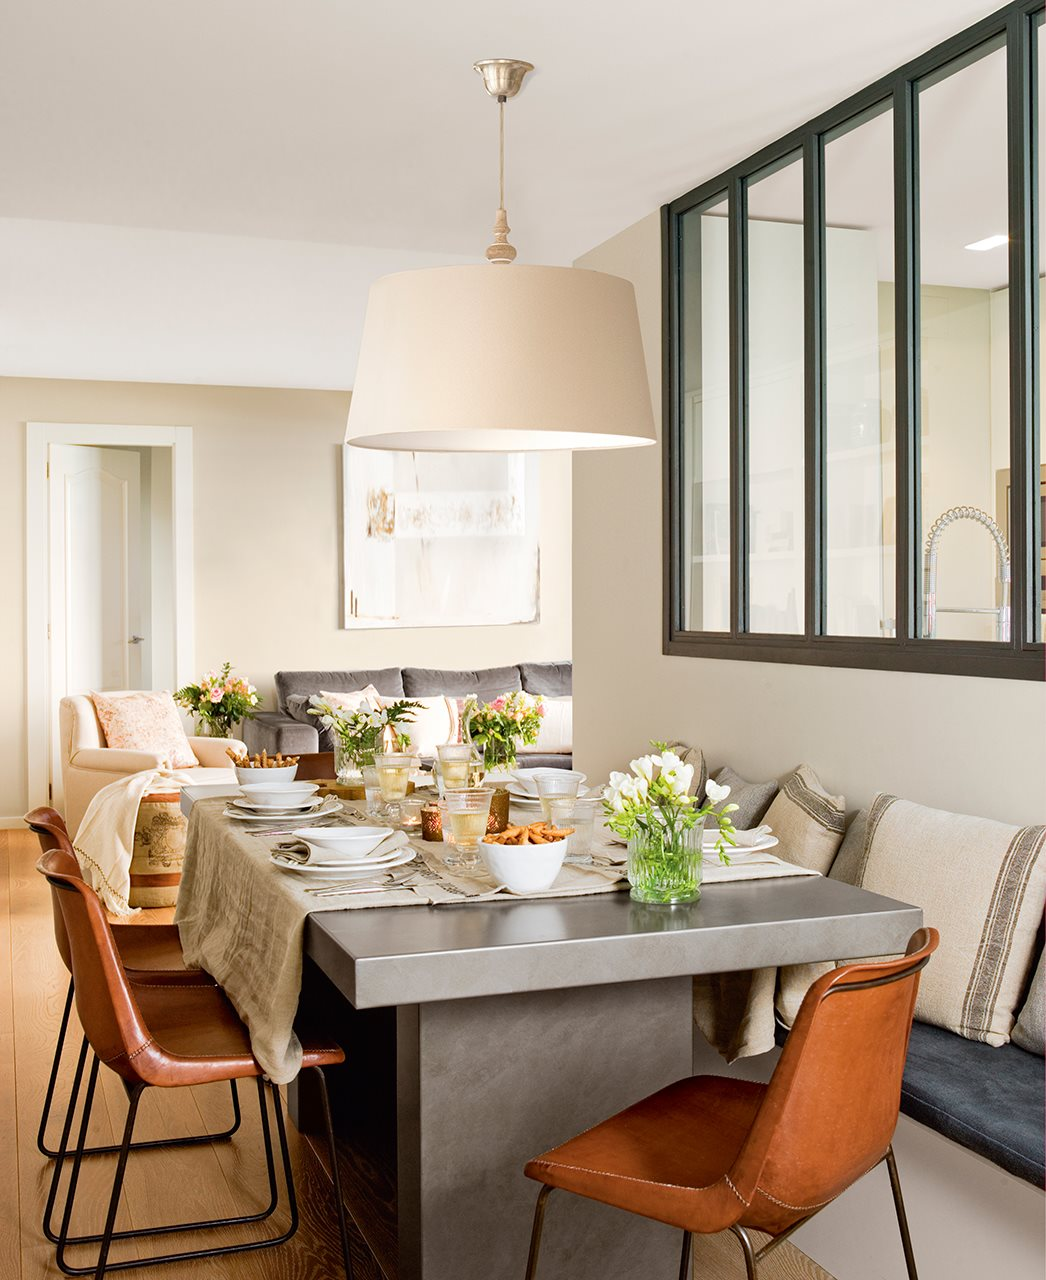 Ideas para espacios peque os for Como acomodar una casa pequena